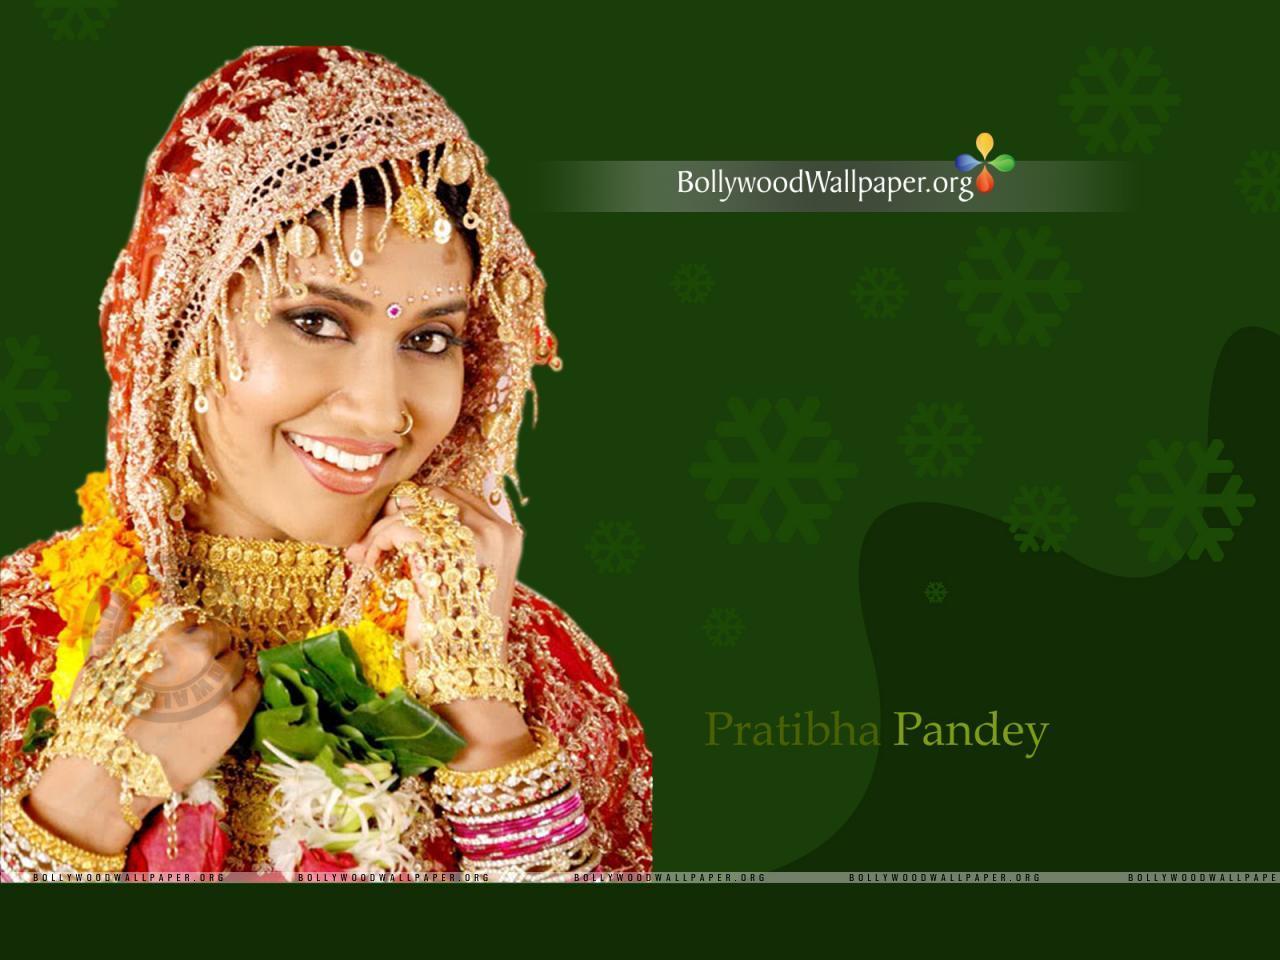 http://3.bp.blogspot.com/-LhW105oHTeY/TtSBQYvtpnI/AAAAAAAAC4g/BiFmPSQ-srg/s1600/Pratibha-Pandey-Wallpaper-002.jpg